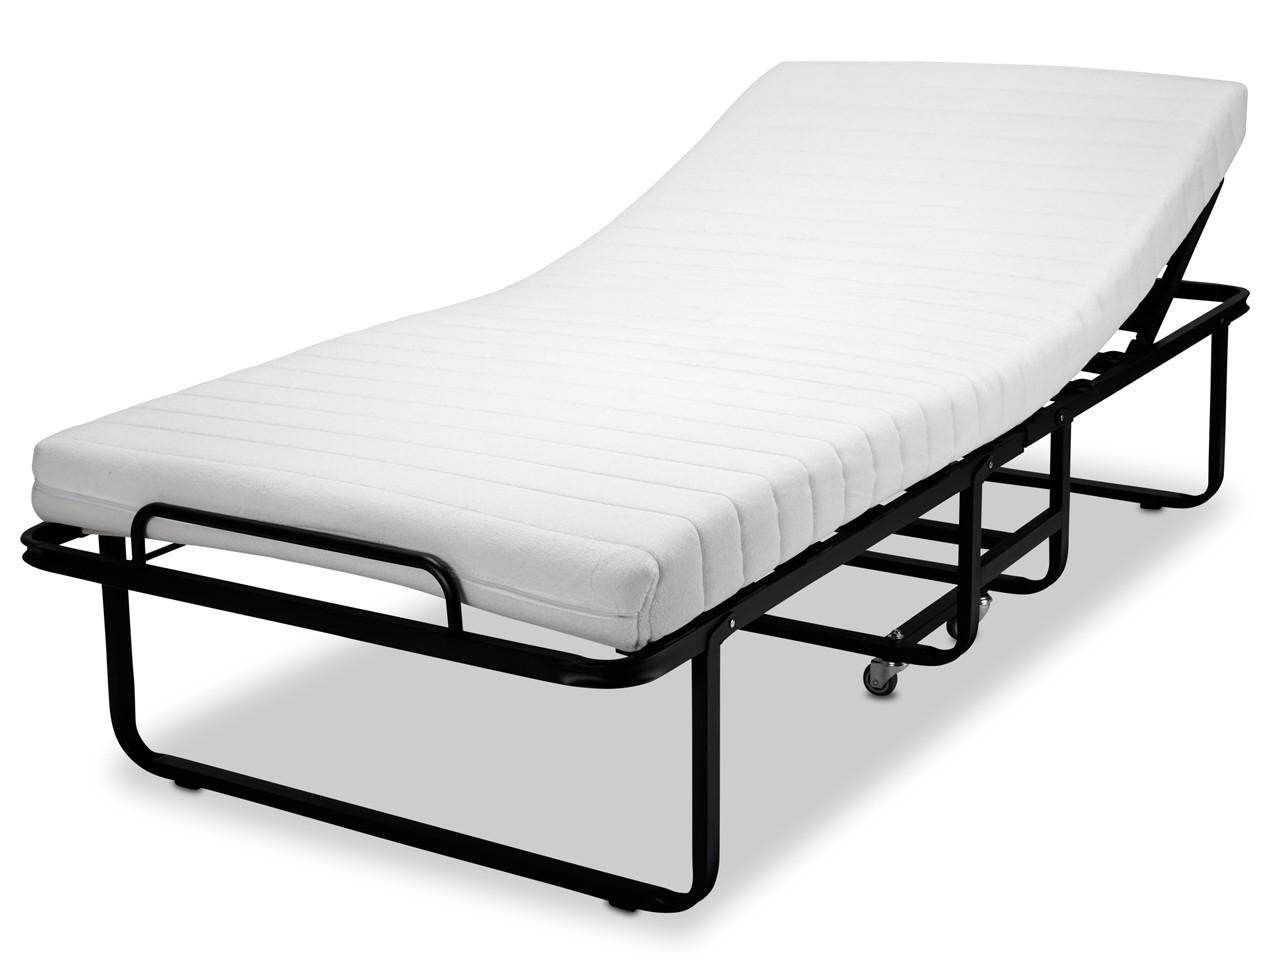 Bed Box Gästebett GB 110 90x200